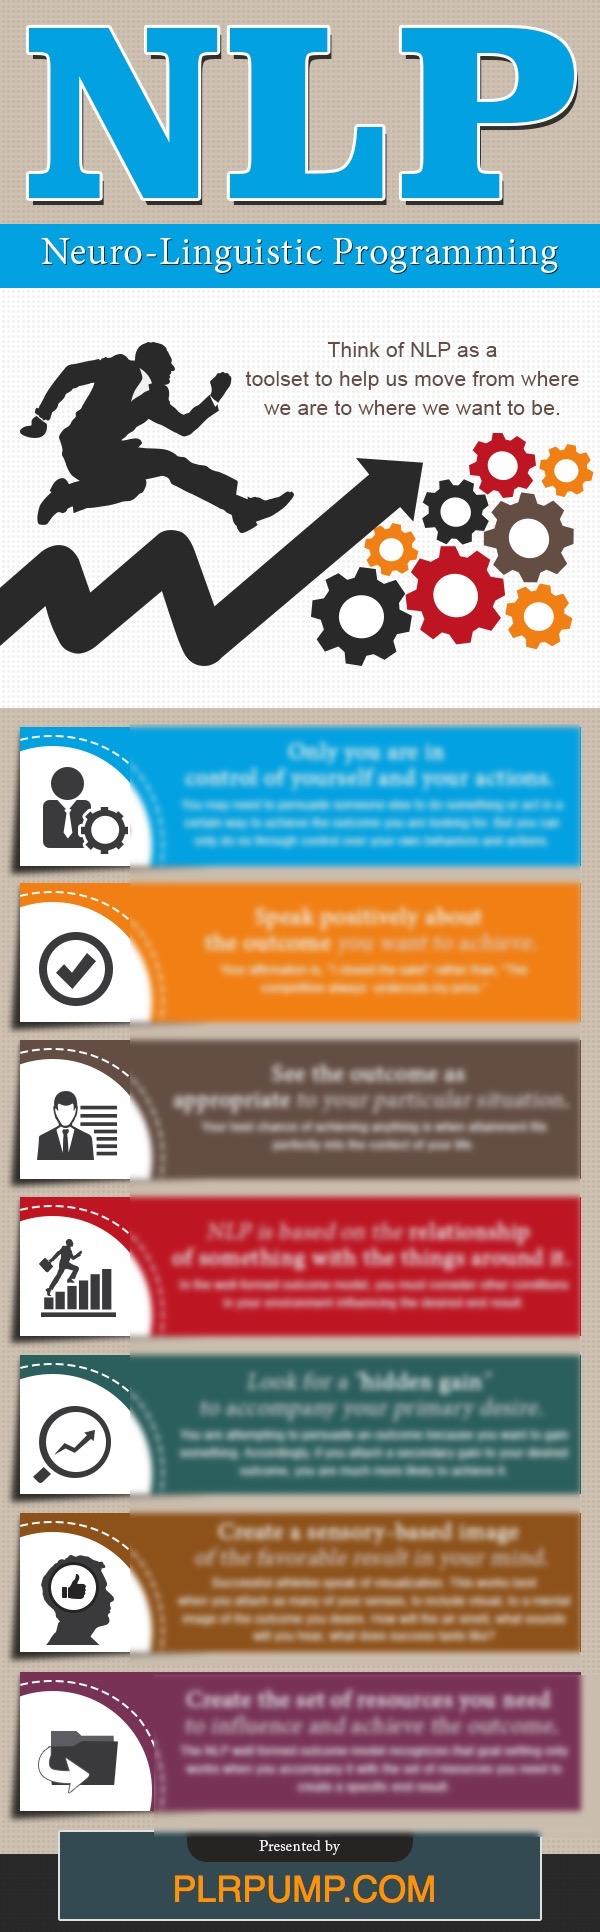 NLP_infographic_BRND